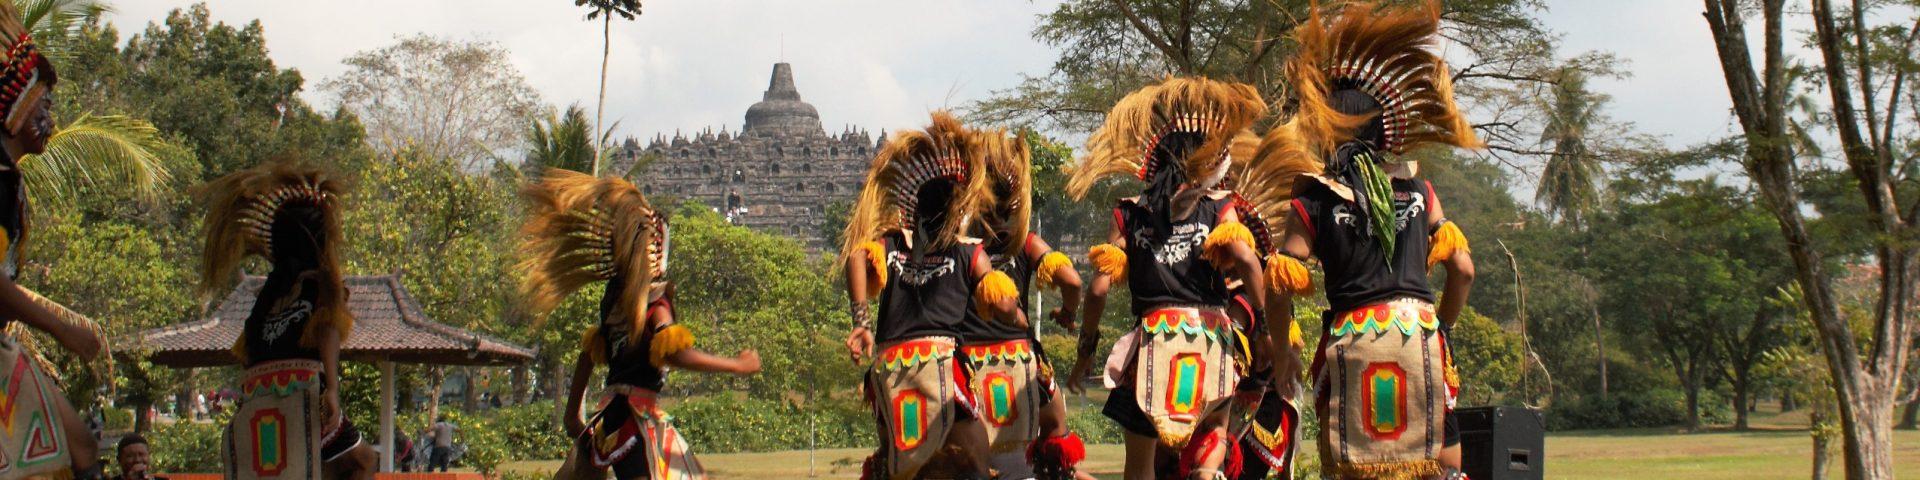 Indonezia Java oferte